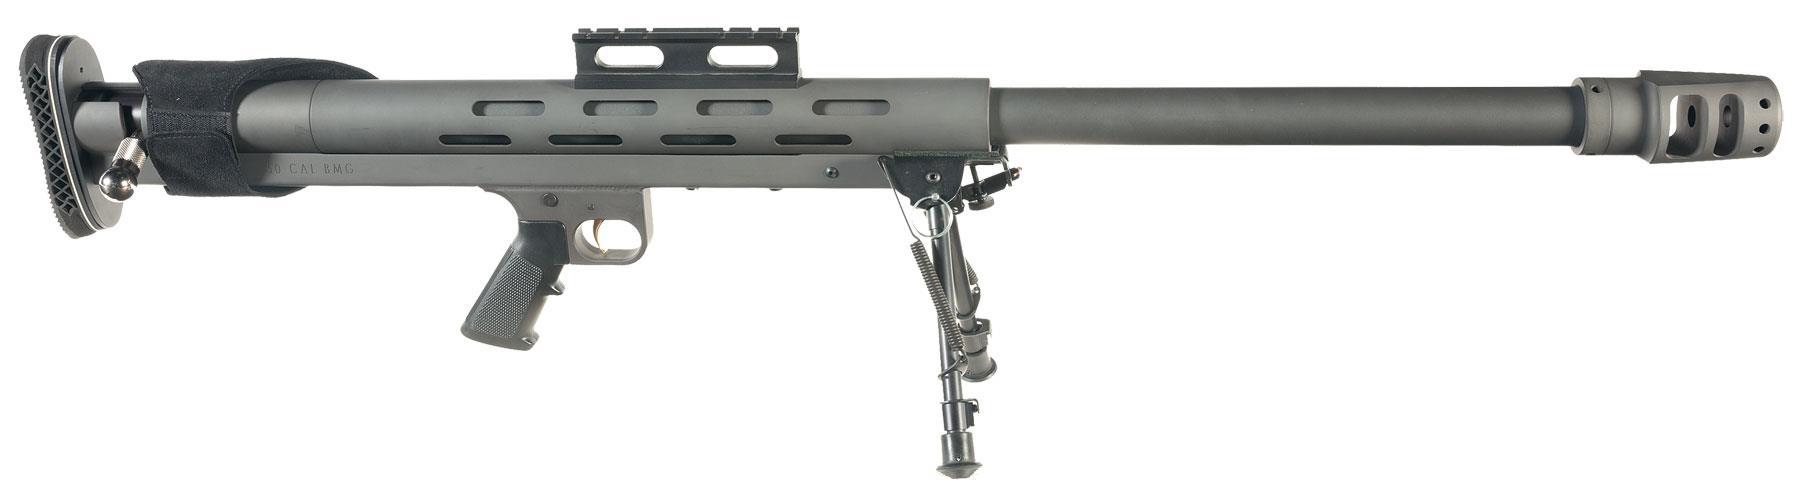 Lar Grizzly 50 Caliber Big Boar Single Shot Bolt Action Rifle